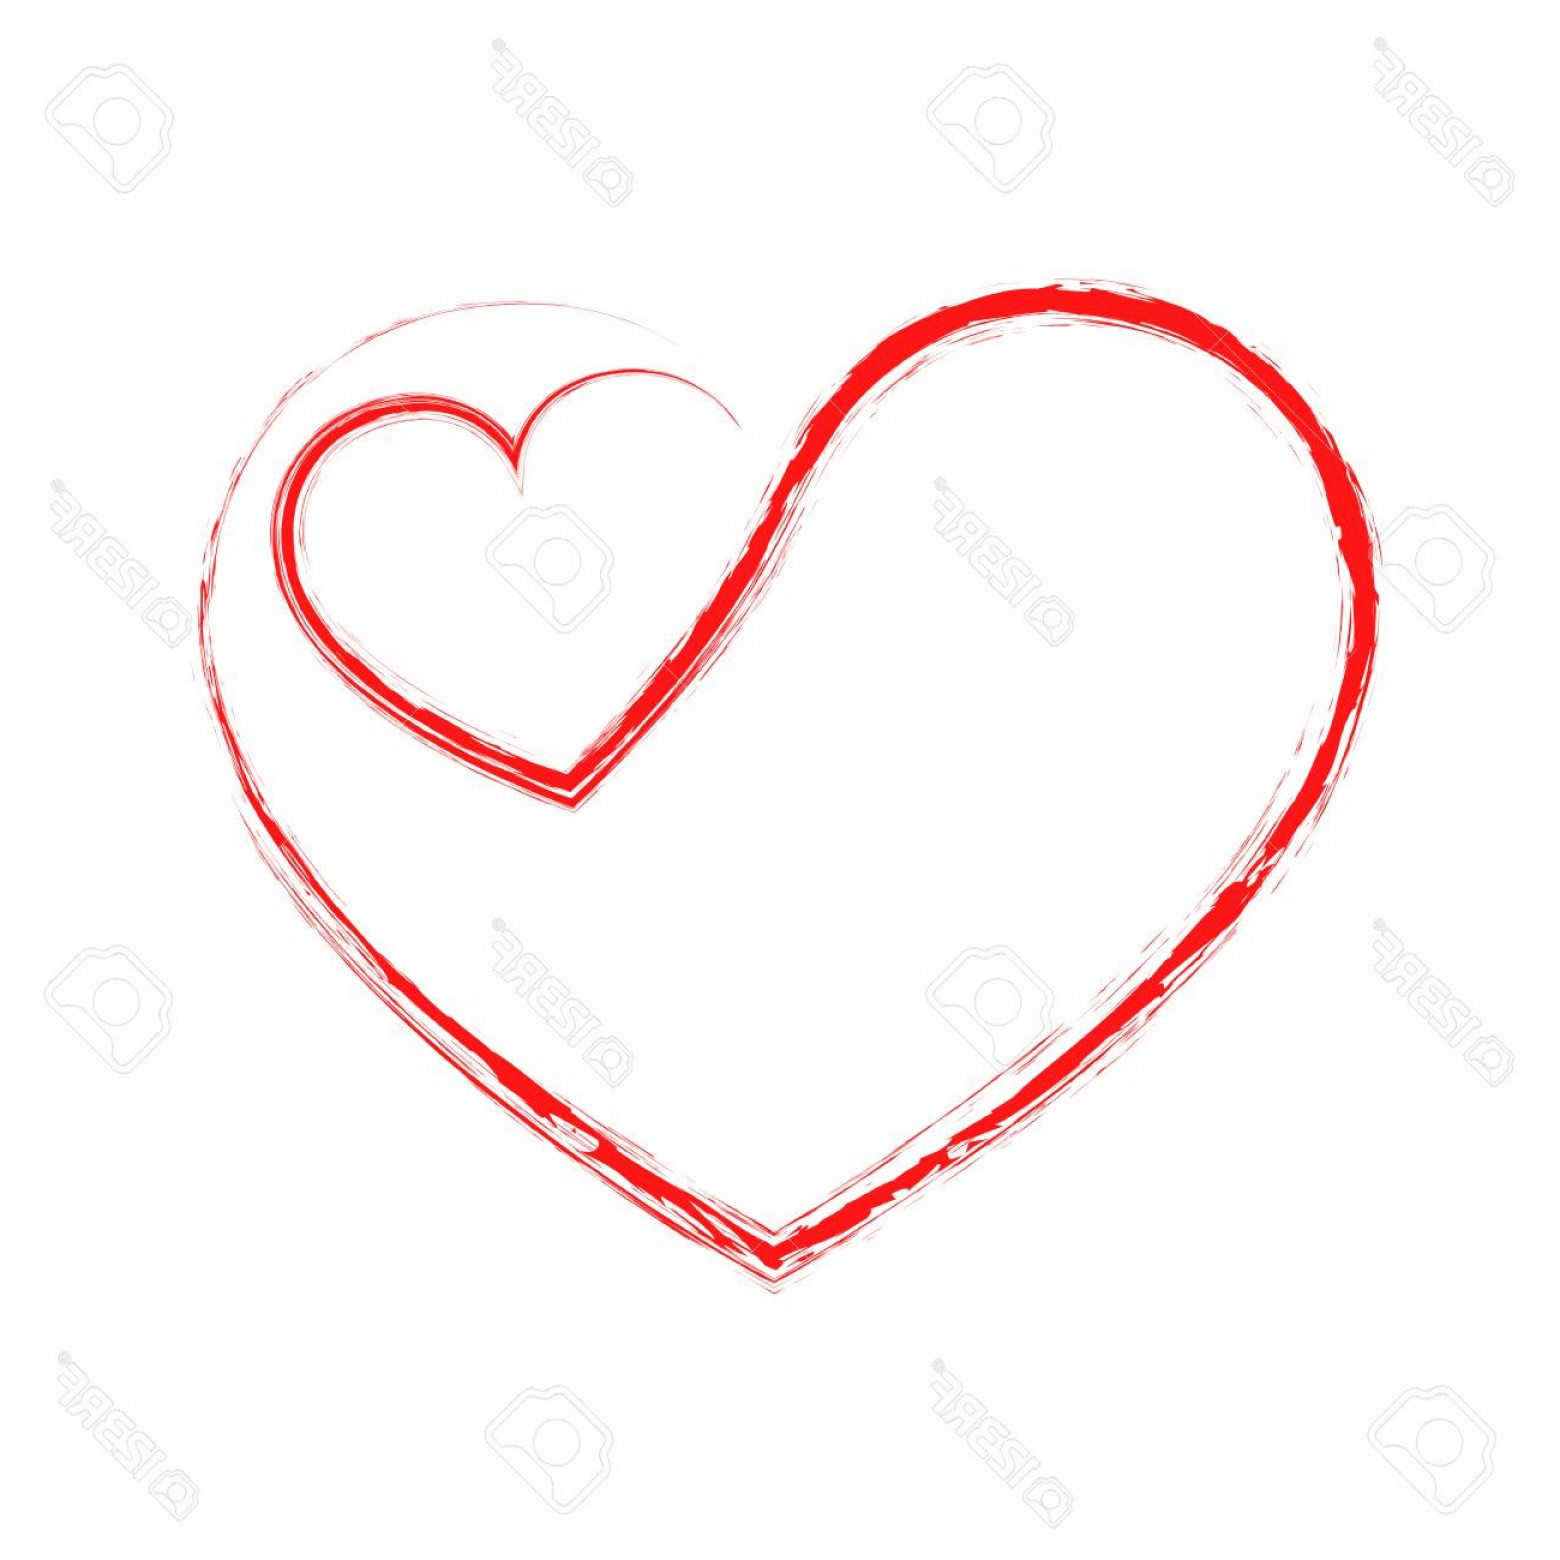 1560x1560 Photostock Vector Abstract Hand Drawn Hearts Vector Illustration